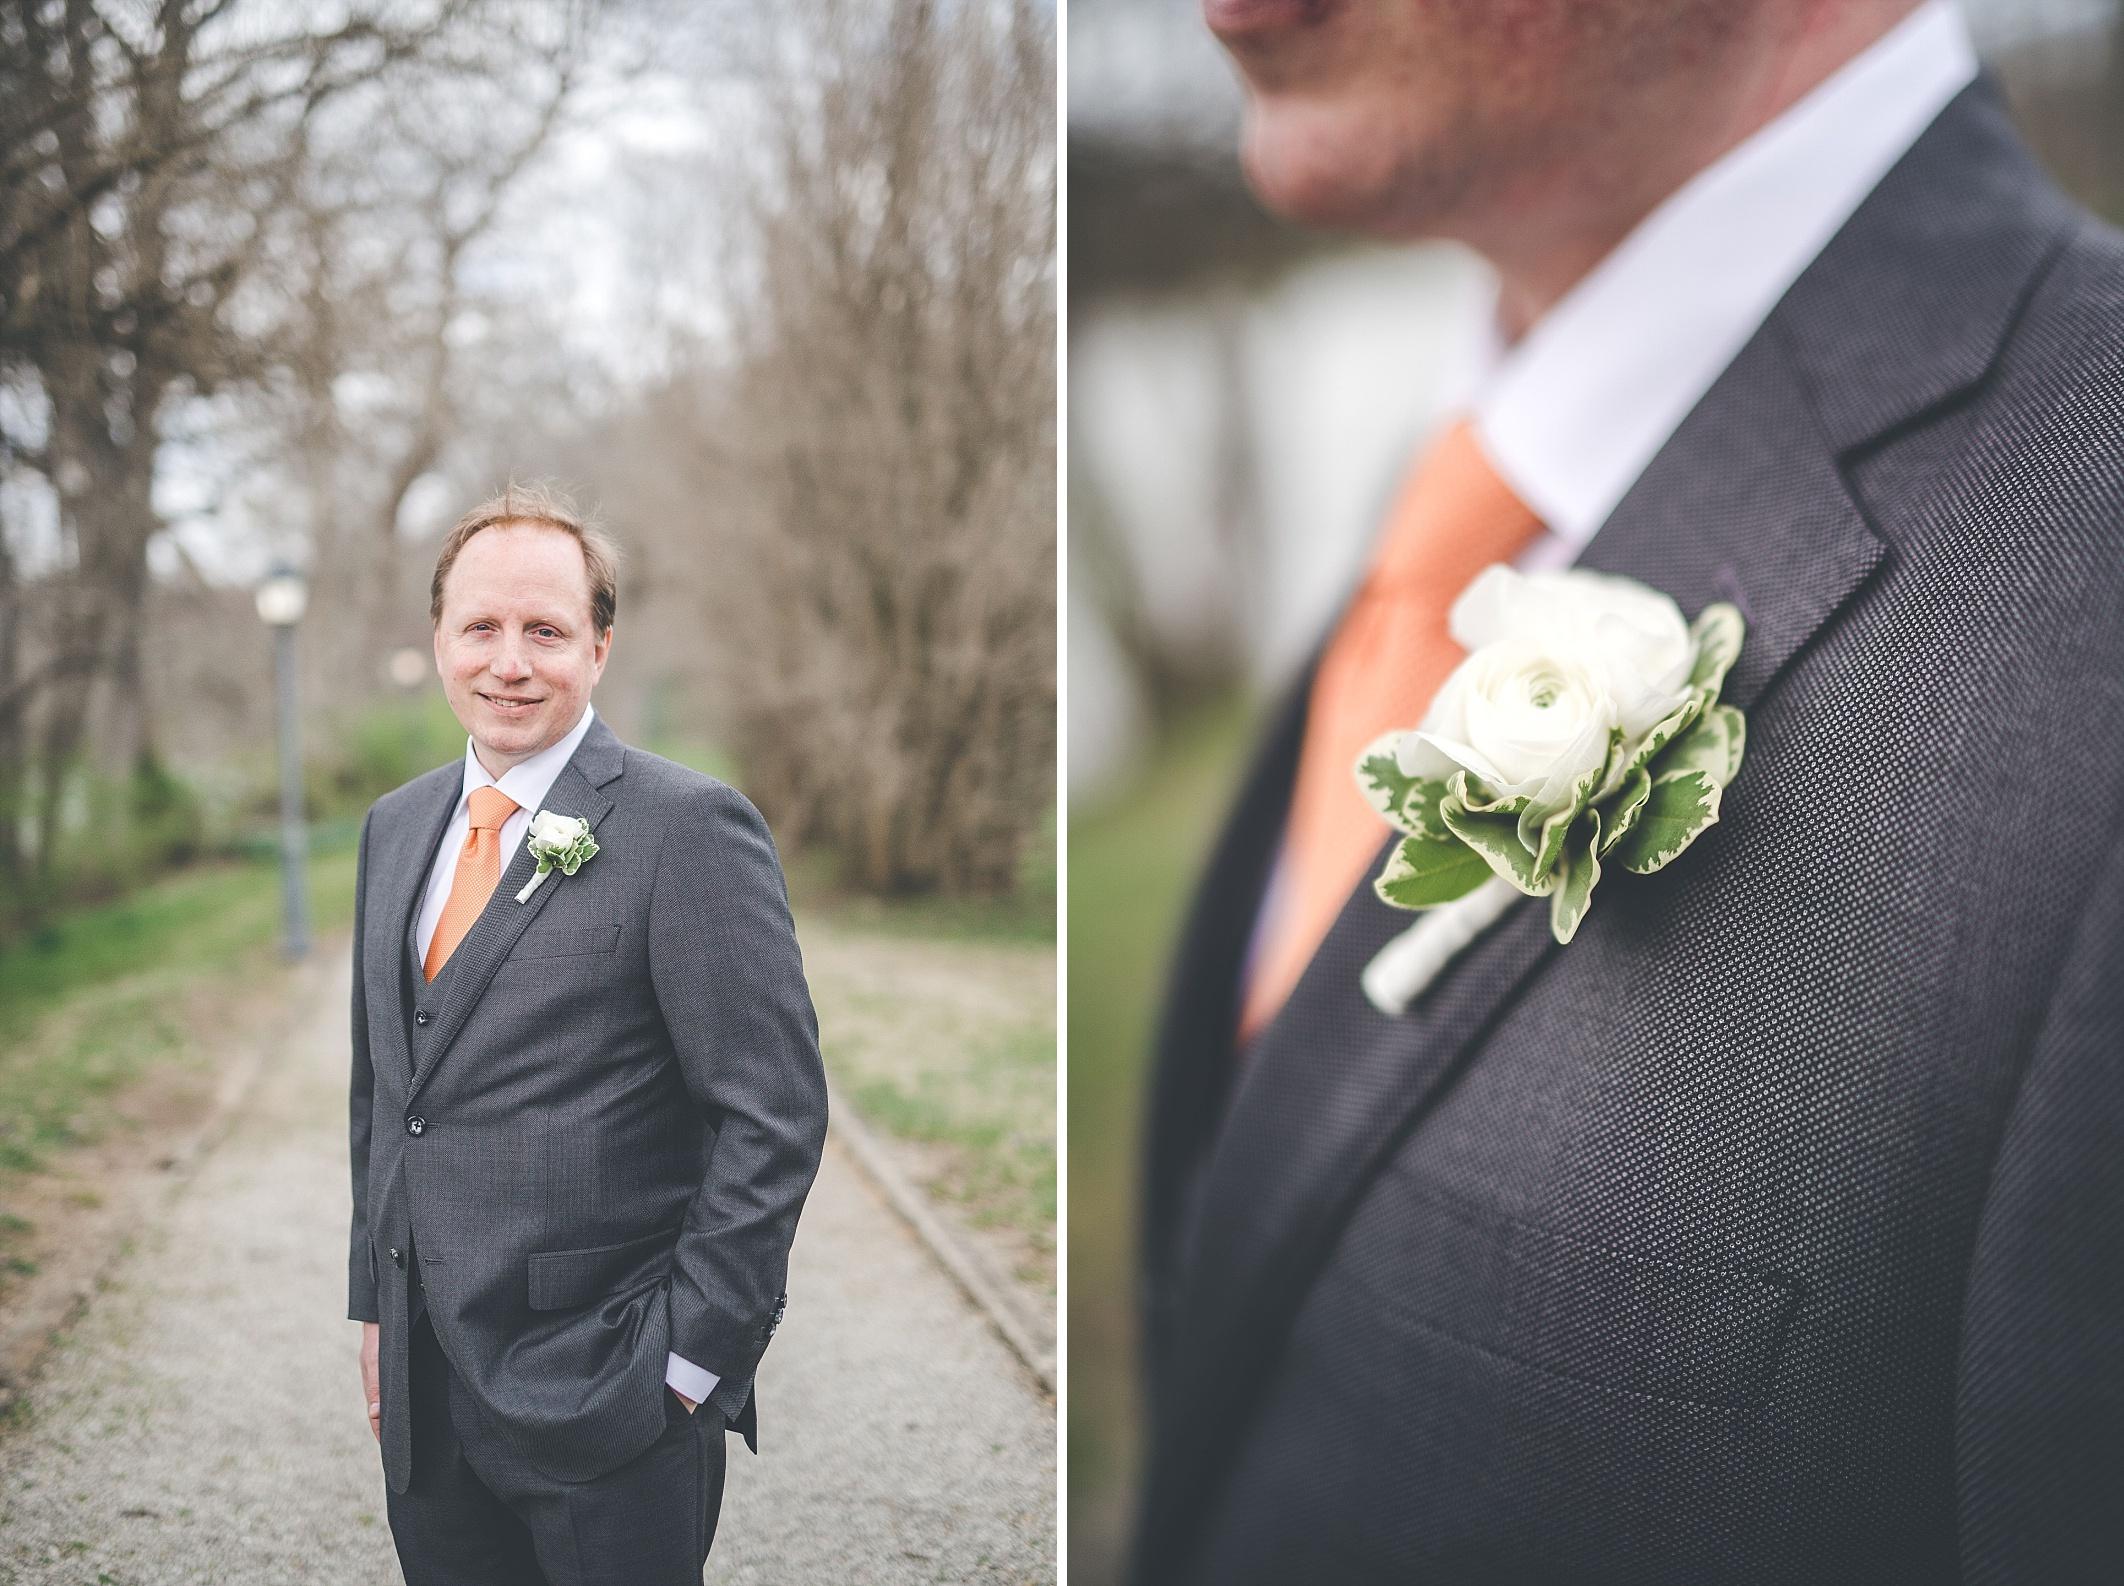 2704_dayton-indian-wedding-photographer-beavercreek_0060.jpg